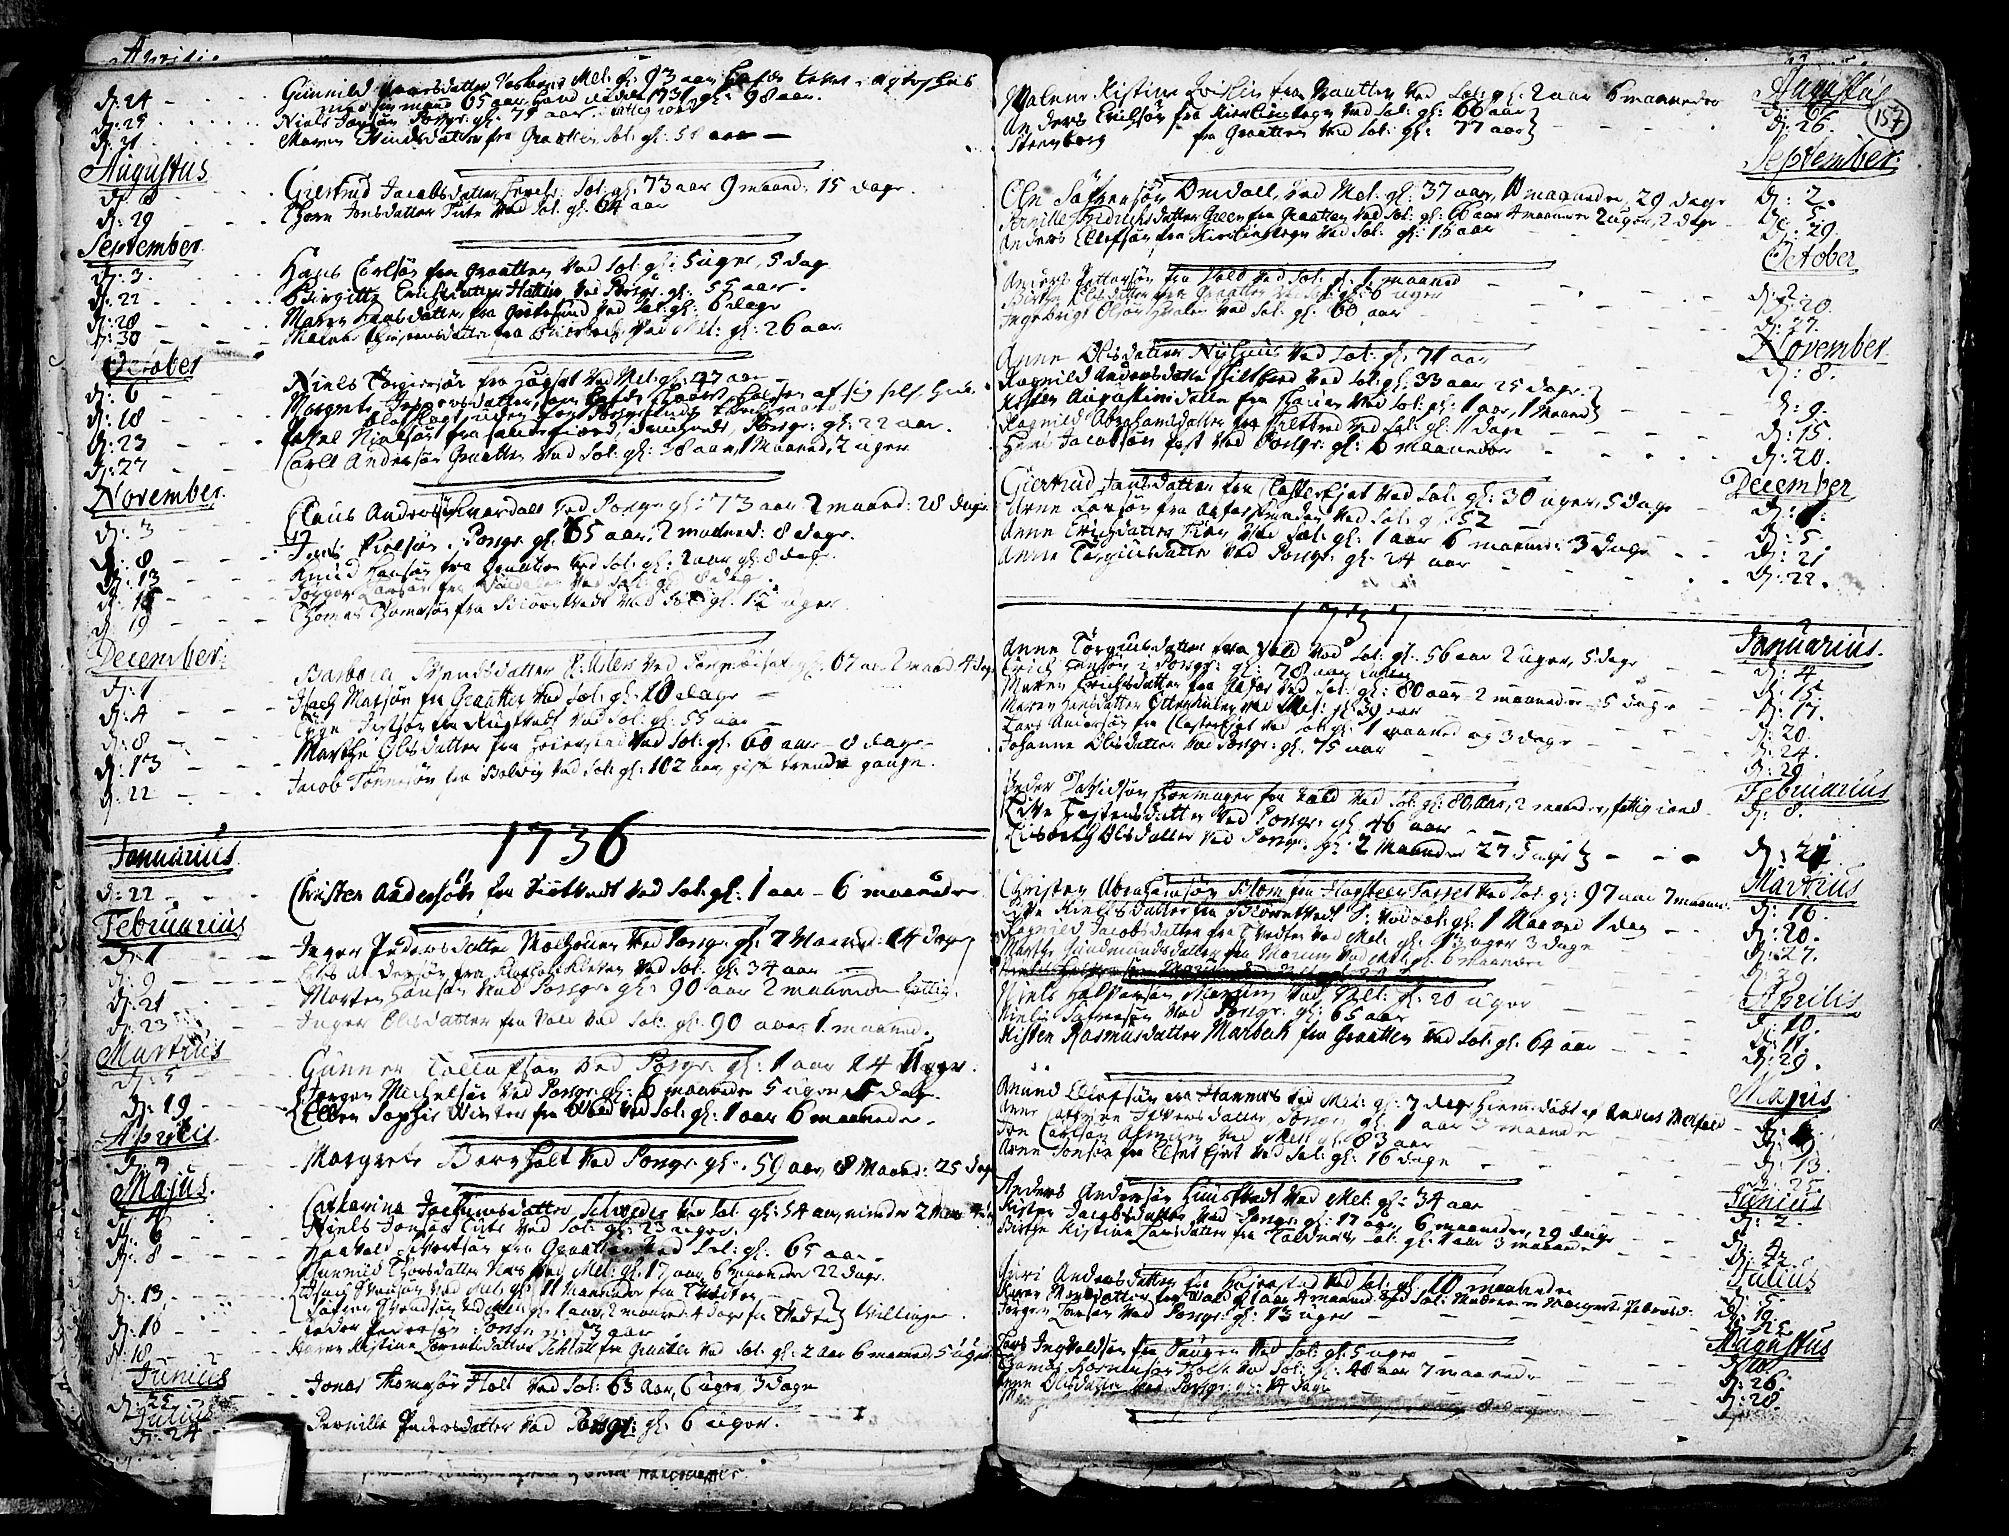 SAKO, Solum kirkebøker, F/Fa/L0002: Ministerialbok nr. I 2, 1713-1761, s. 157